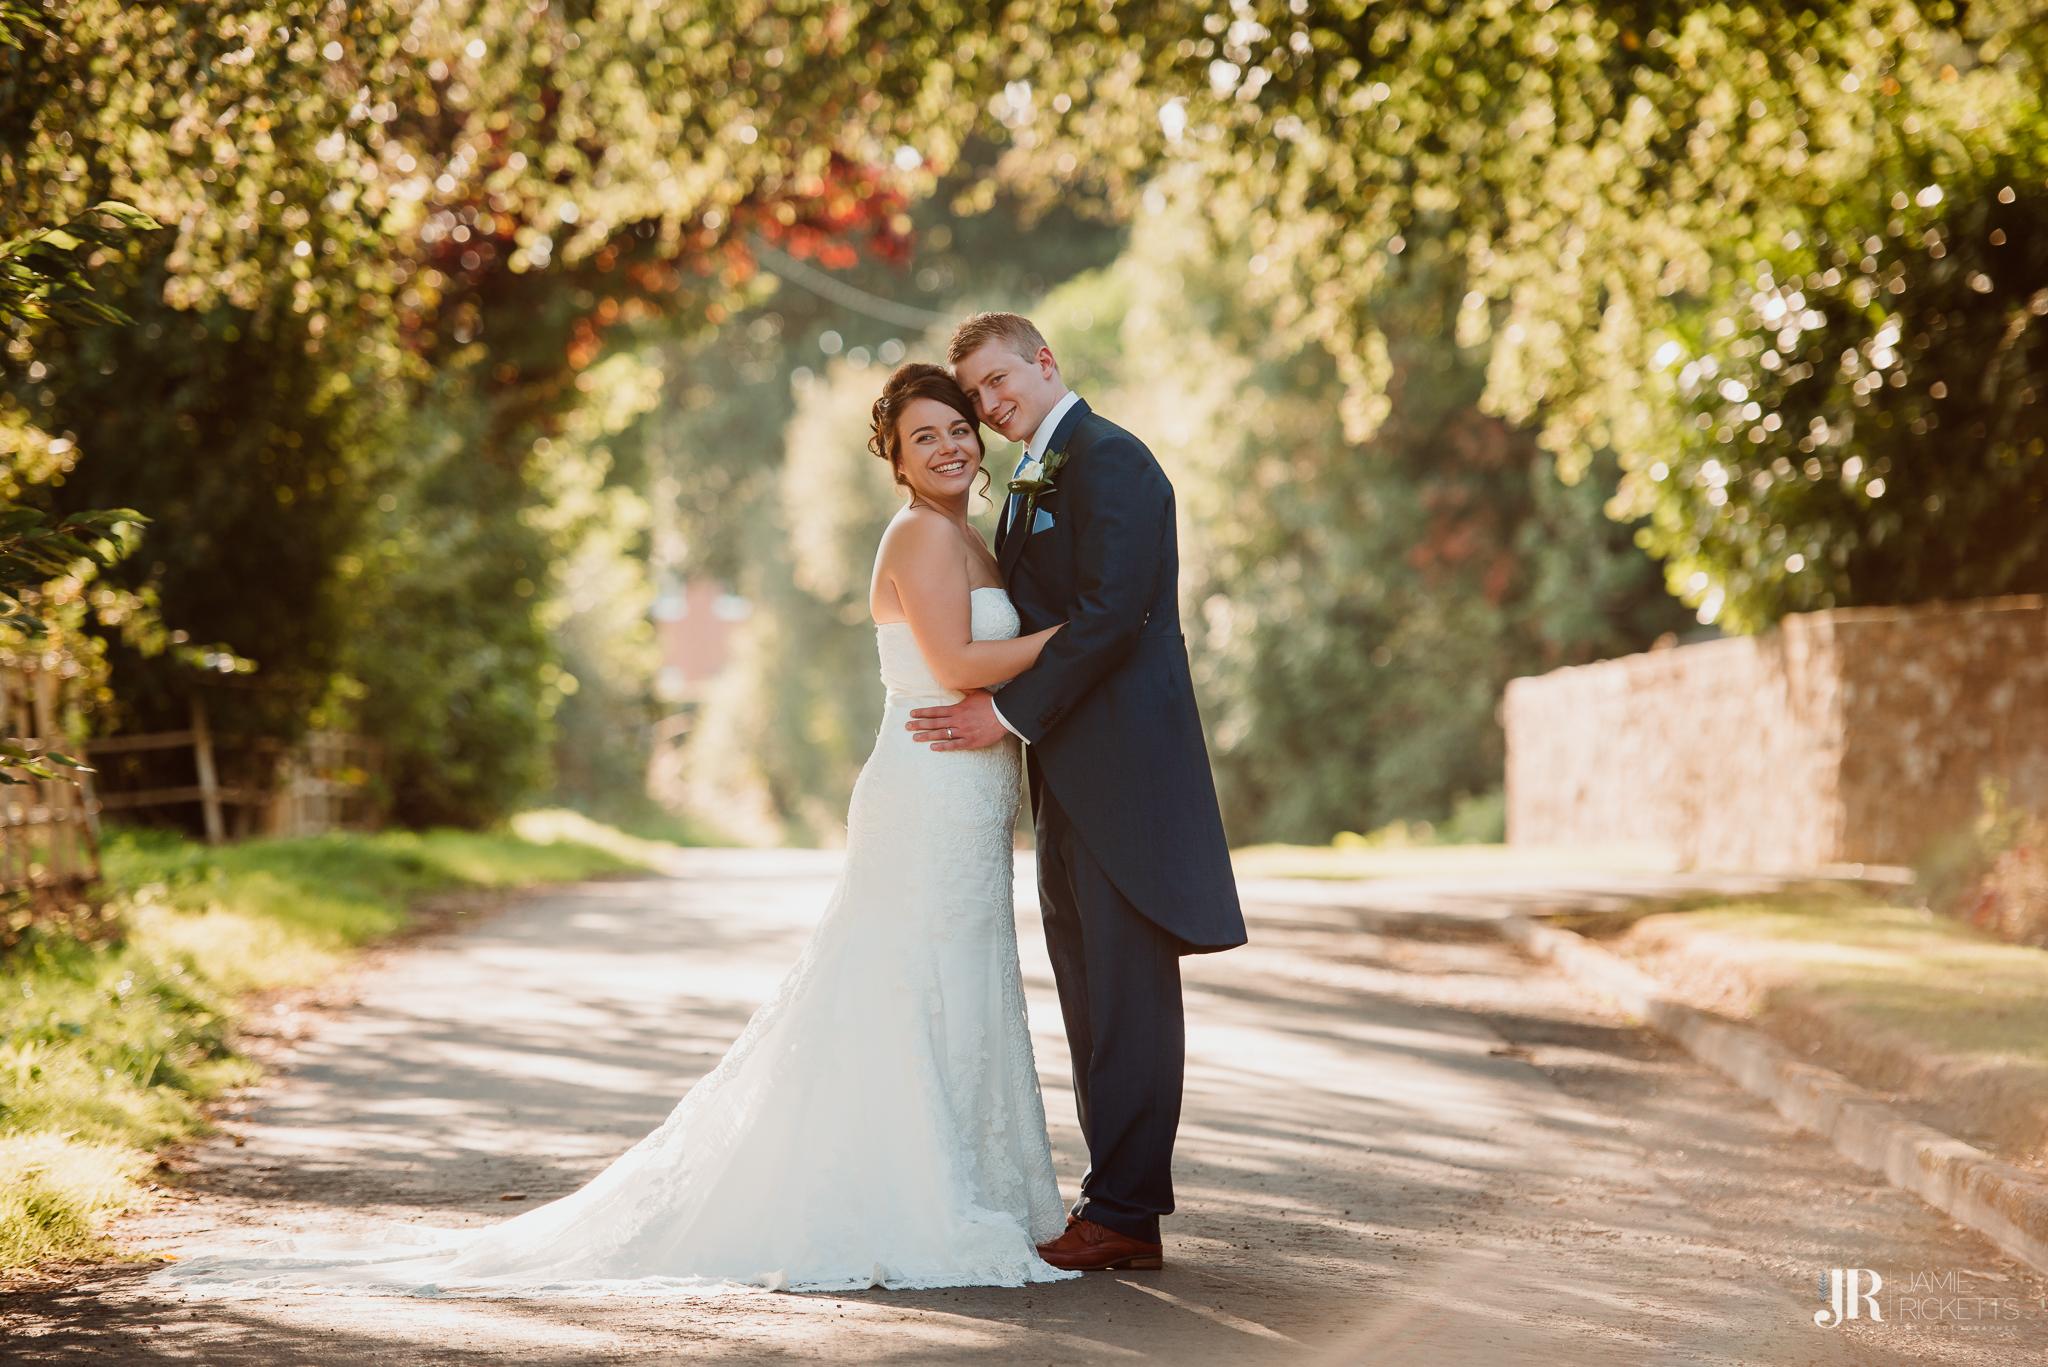 Wedding-Photographer-Shropshire-2.JPG